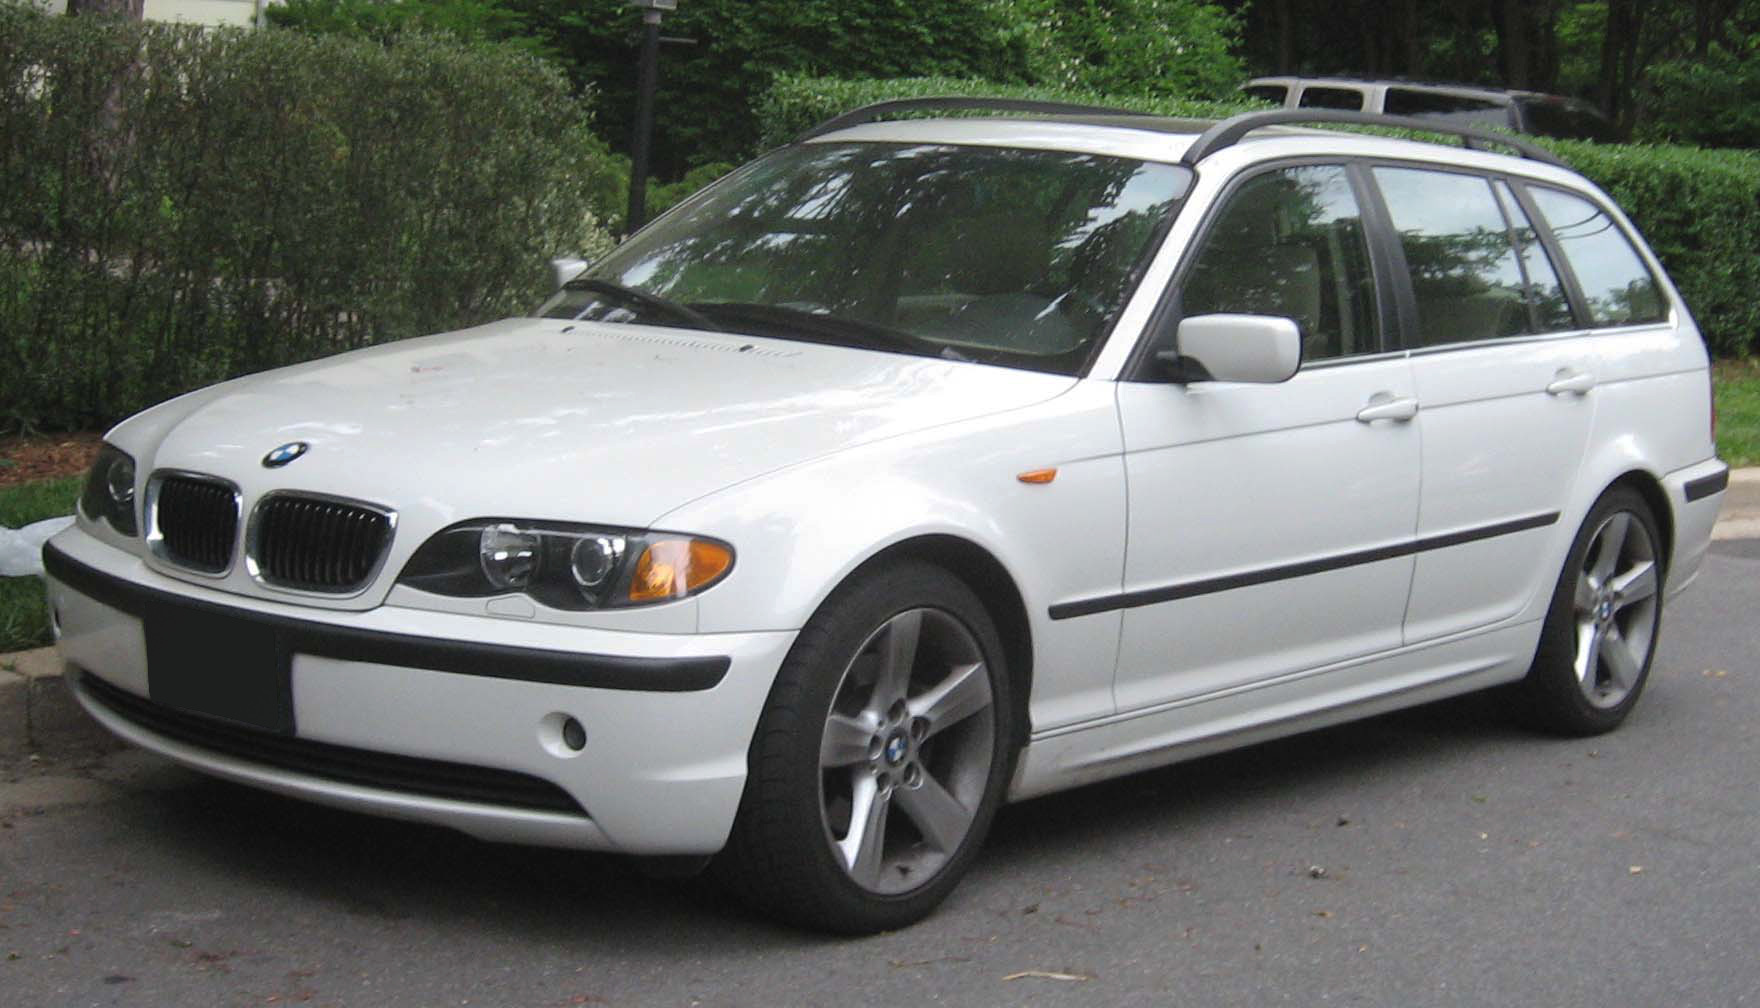 Bmw E Touring on 2003 Bmw 325i Convertible